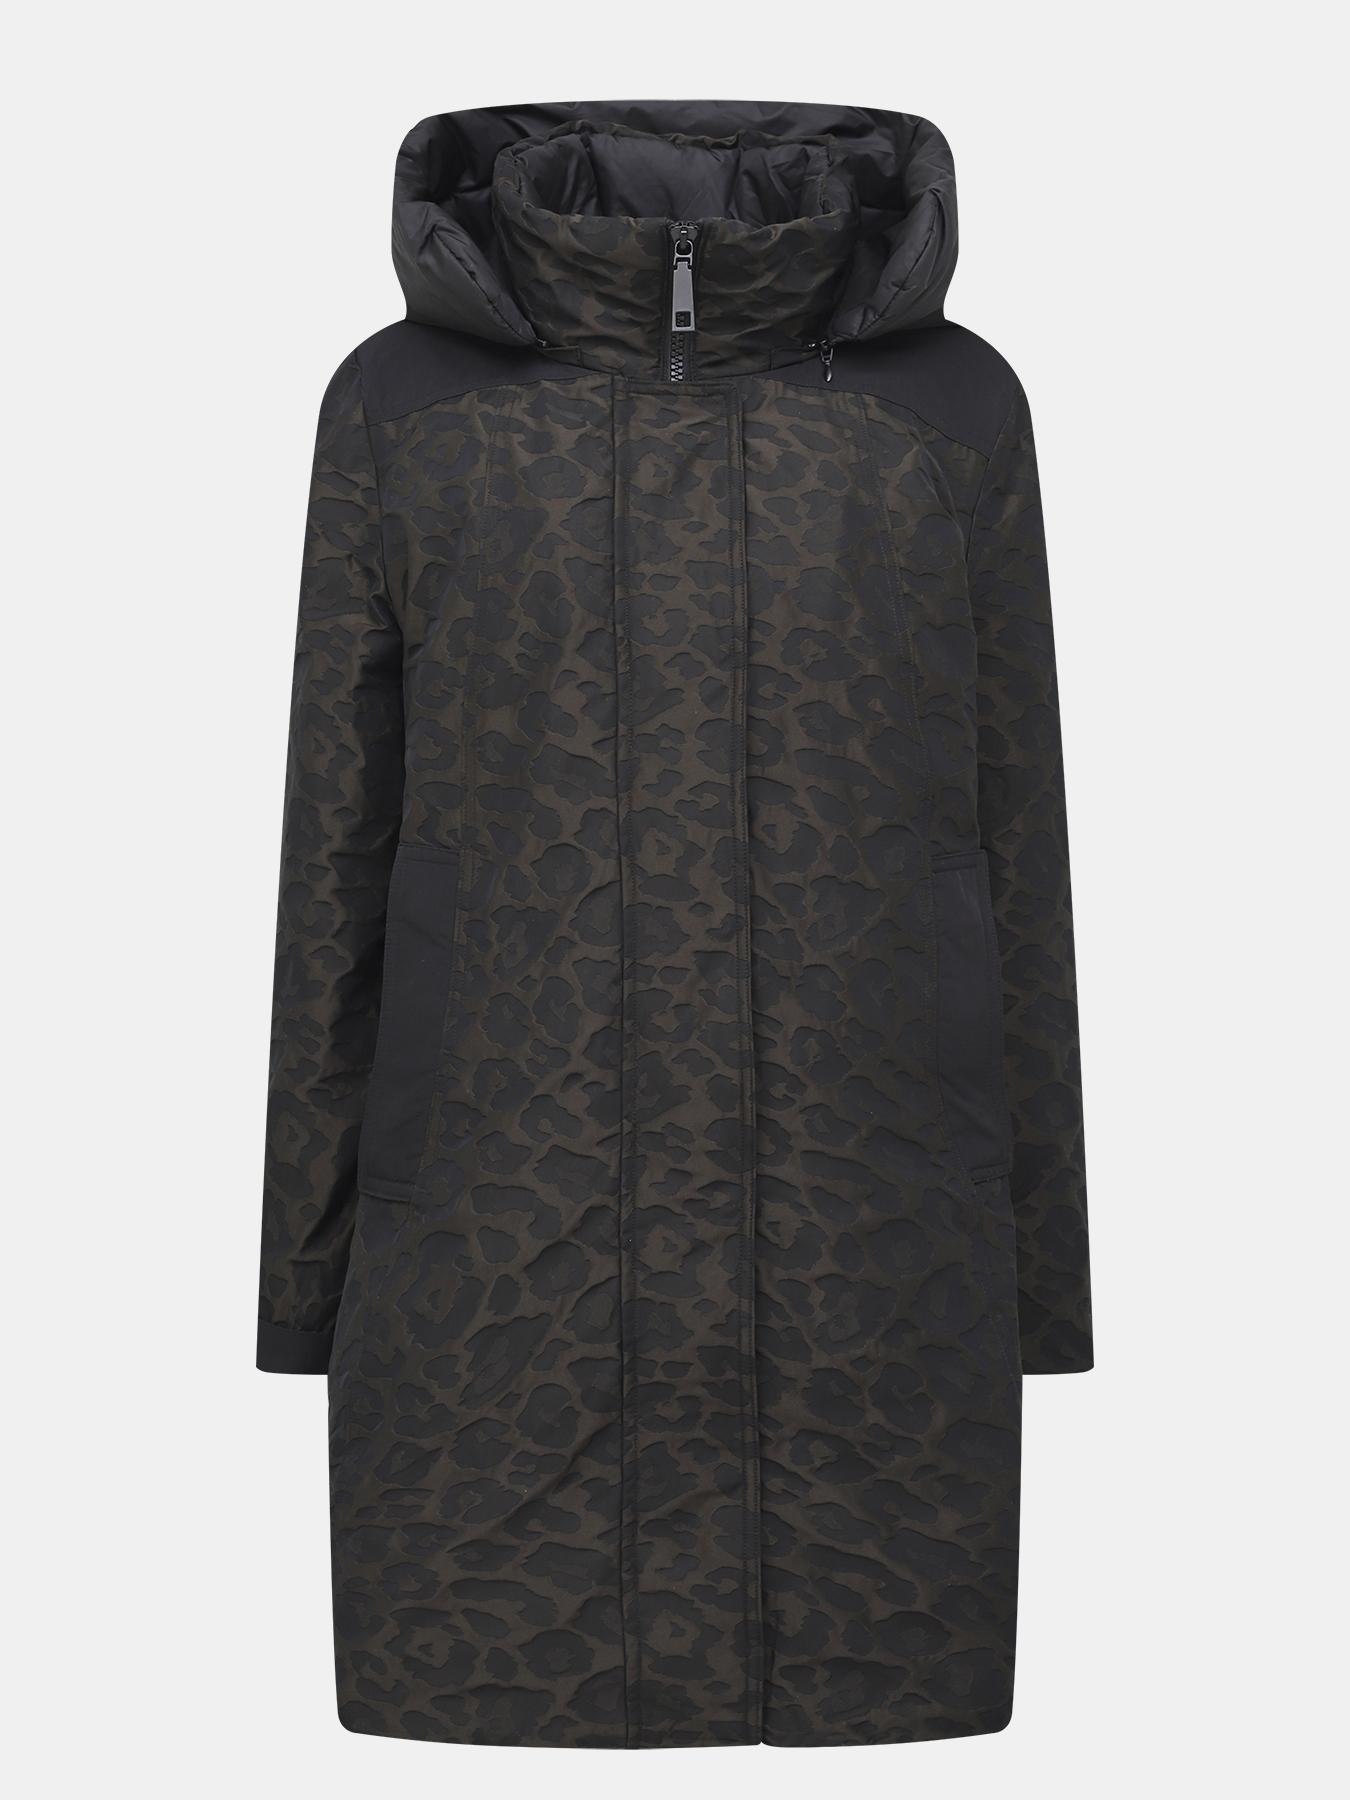 Фото - Куртки Gerry Weber Edition Куртка куртка утепленная jorg weber jorg weber mp002xm0yi6y